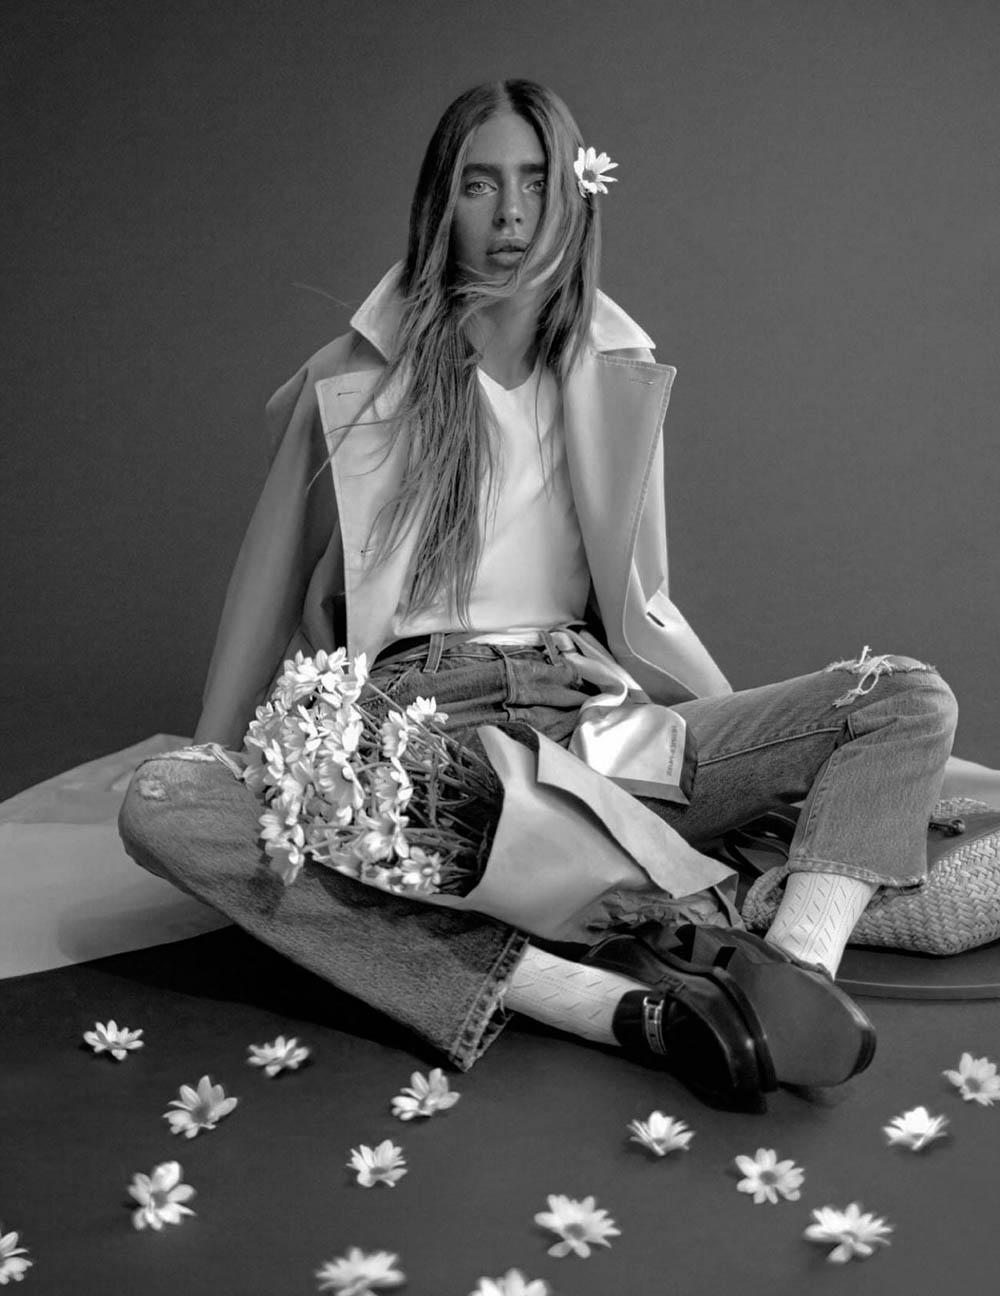 Minerva Portillo by Álvaro Gracia for Harper's Bazaar Spain July/August 2020